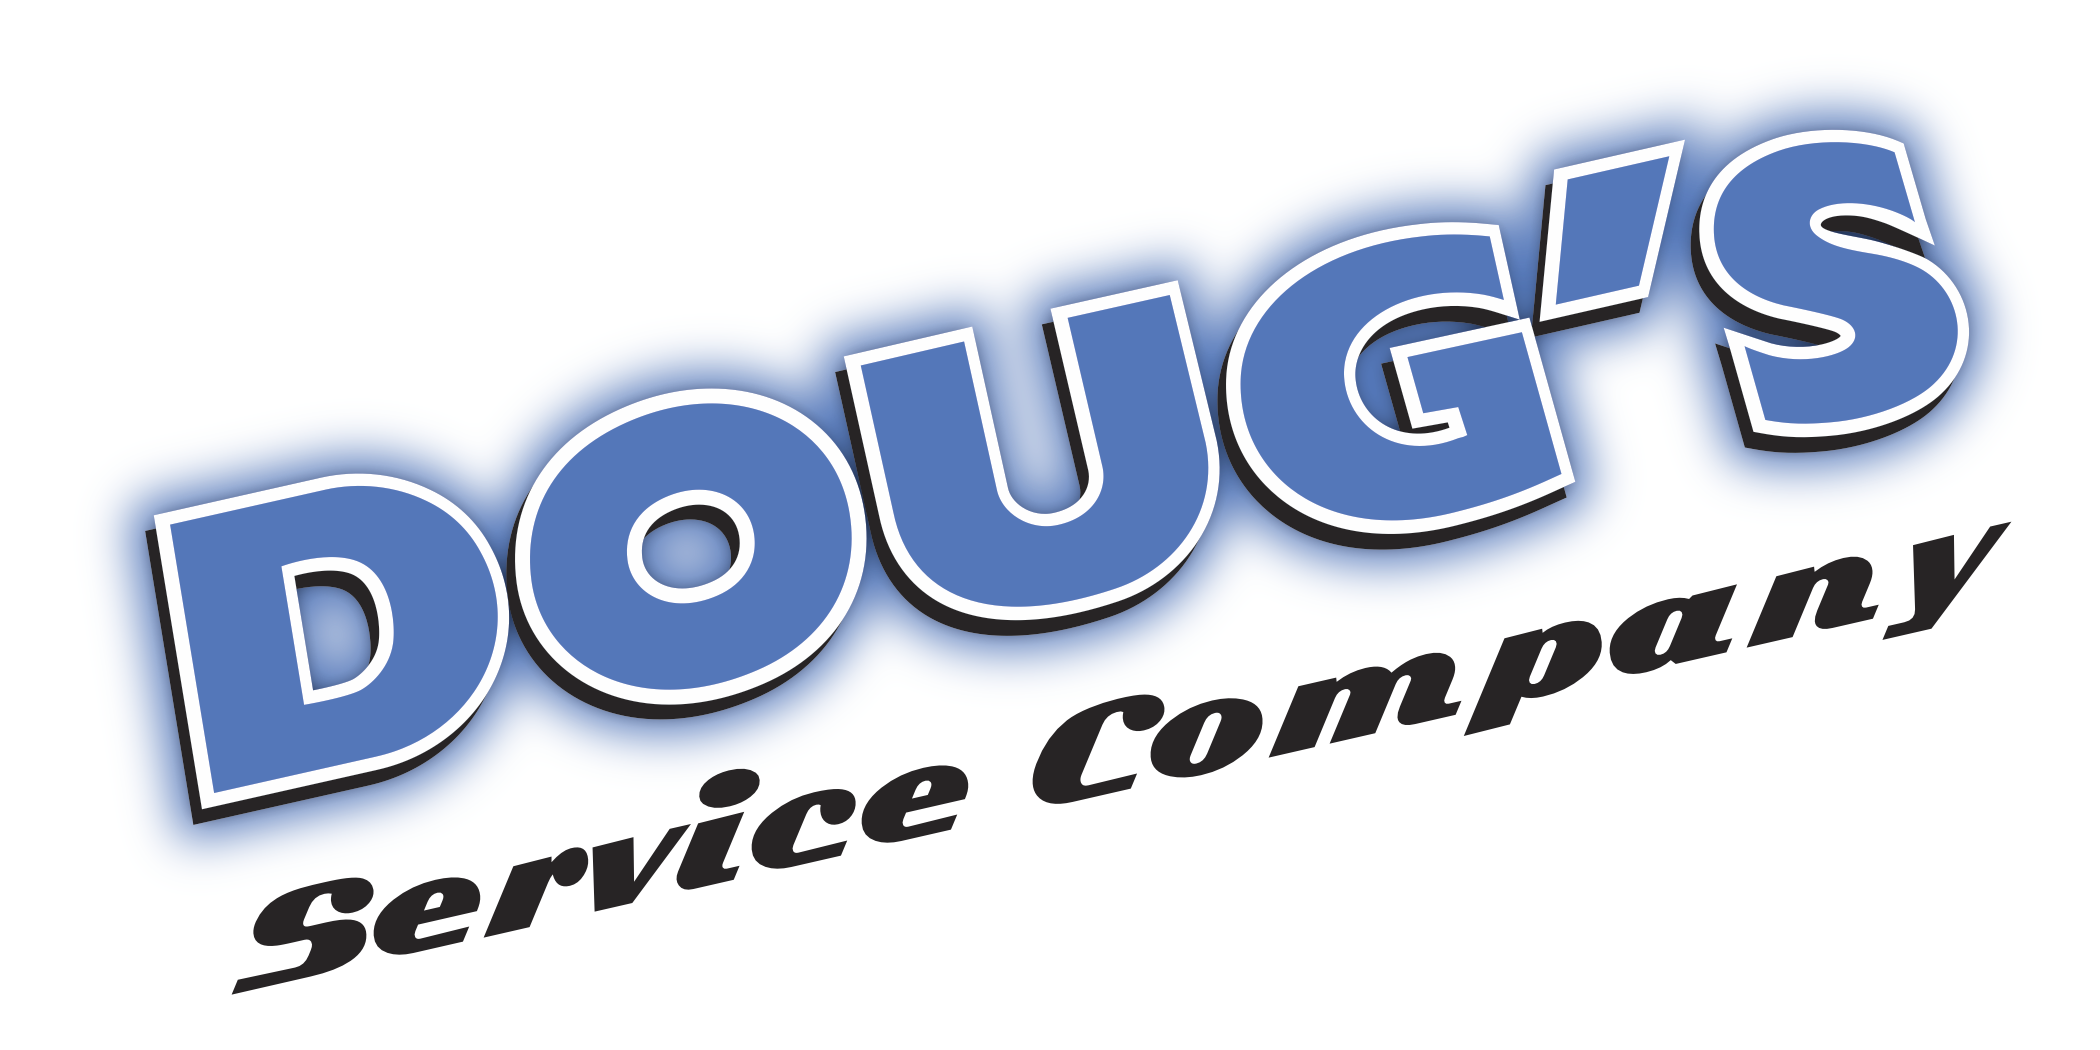 Doug's Service Company